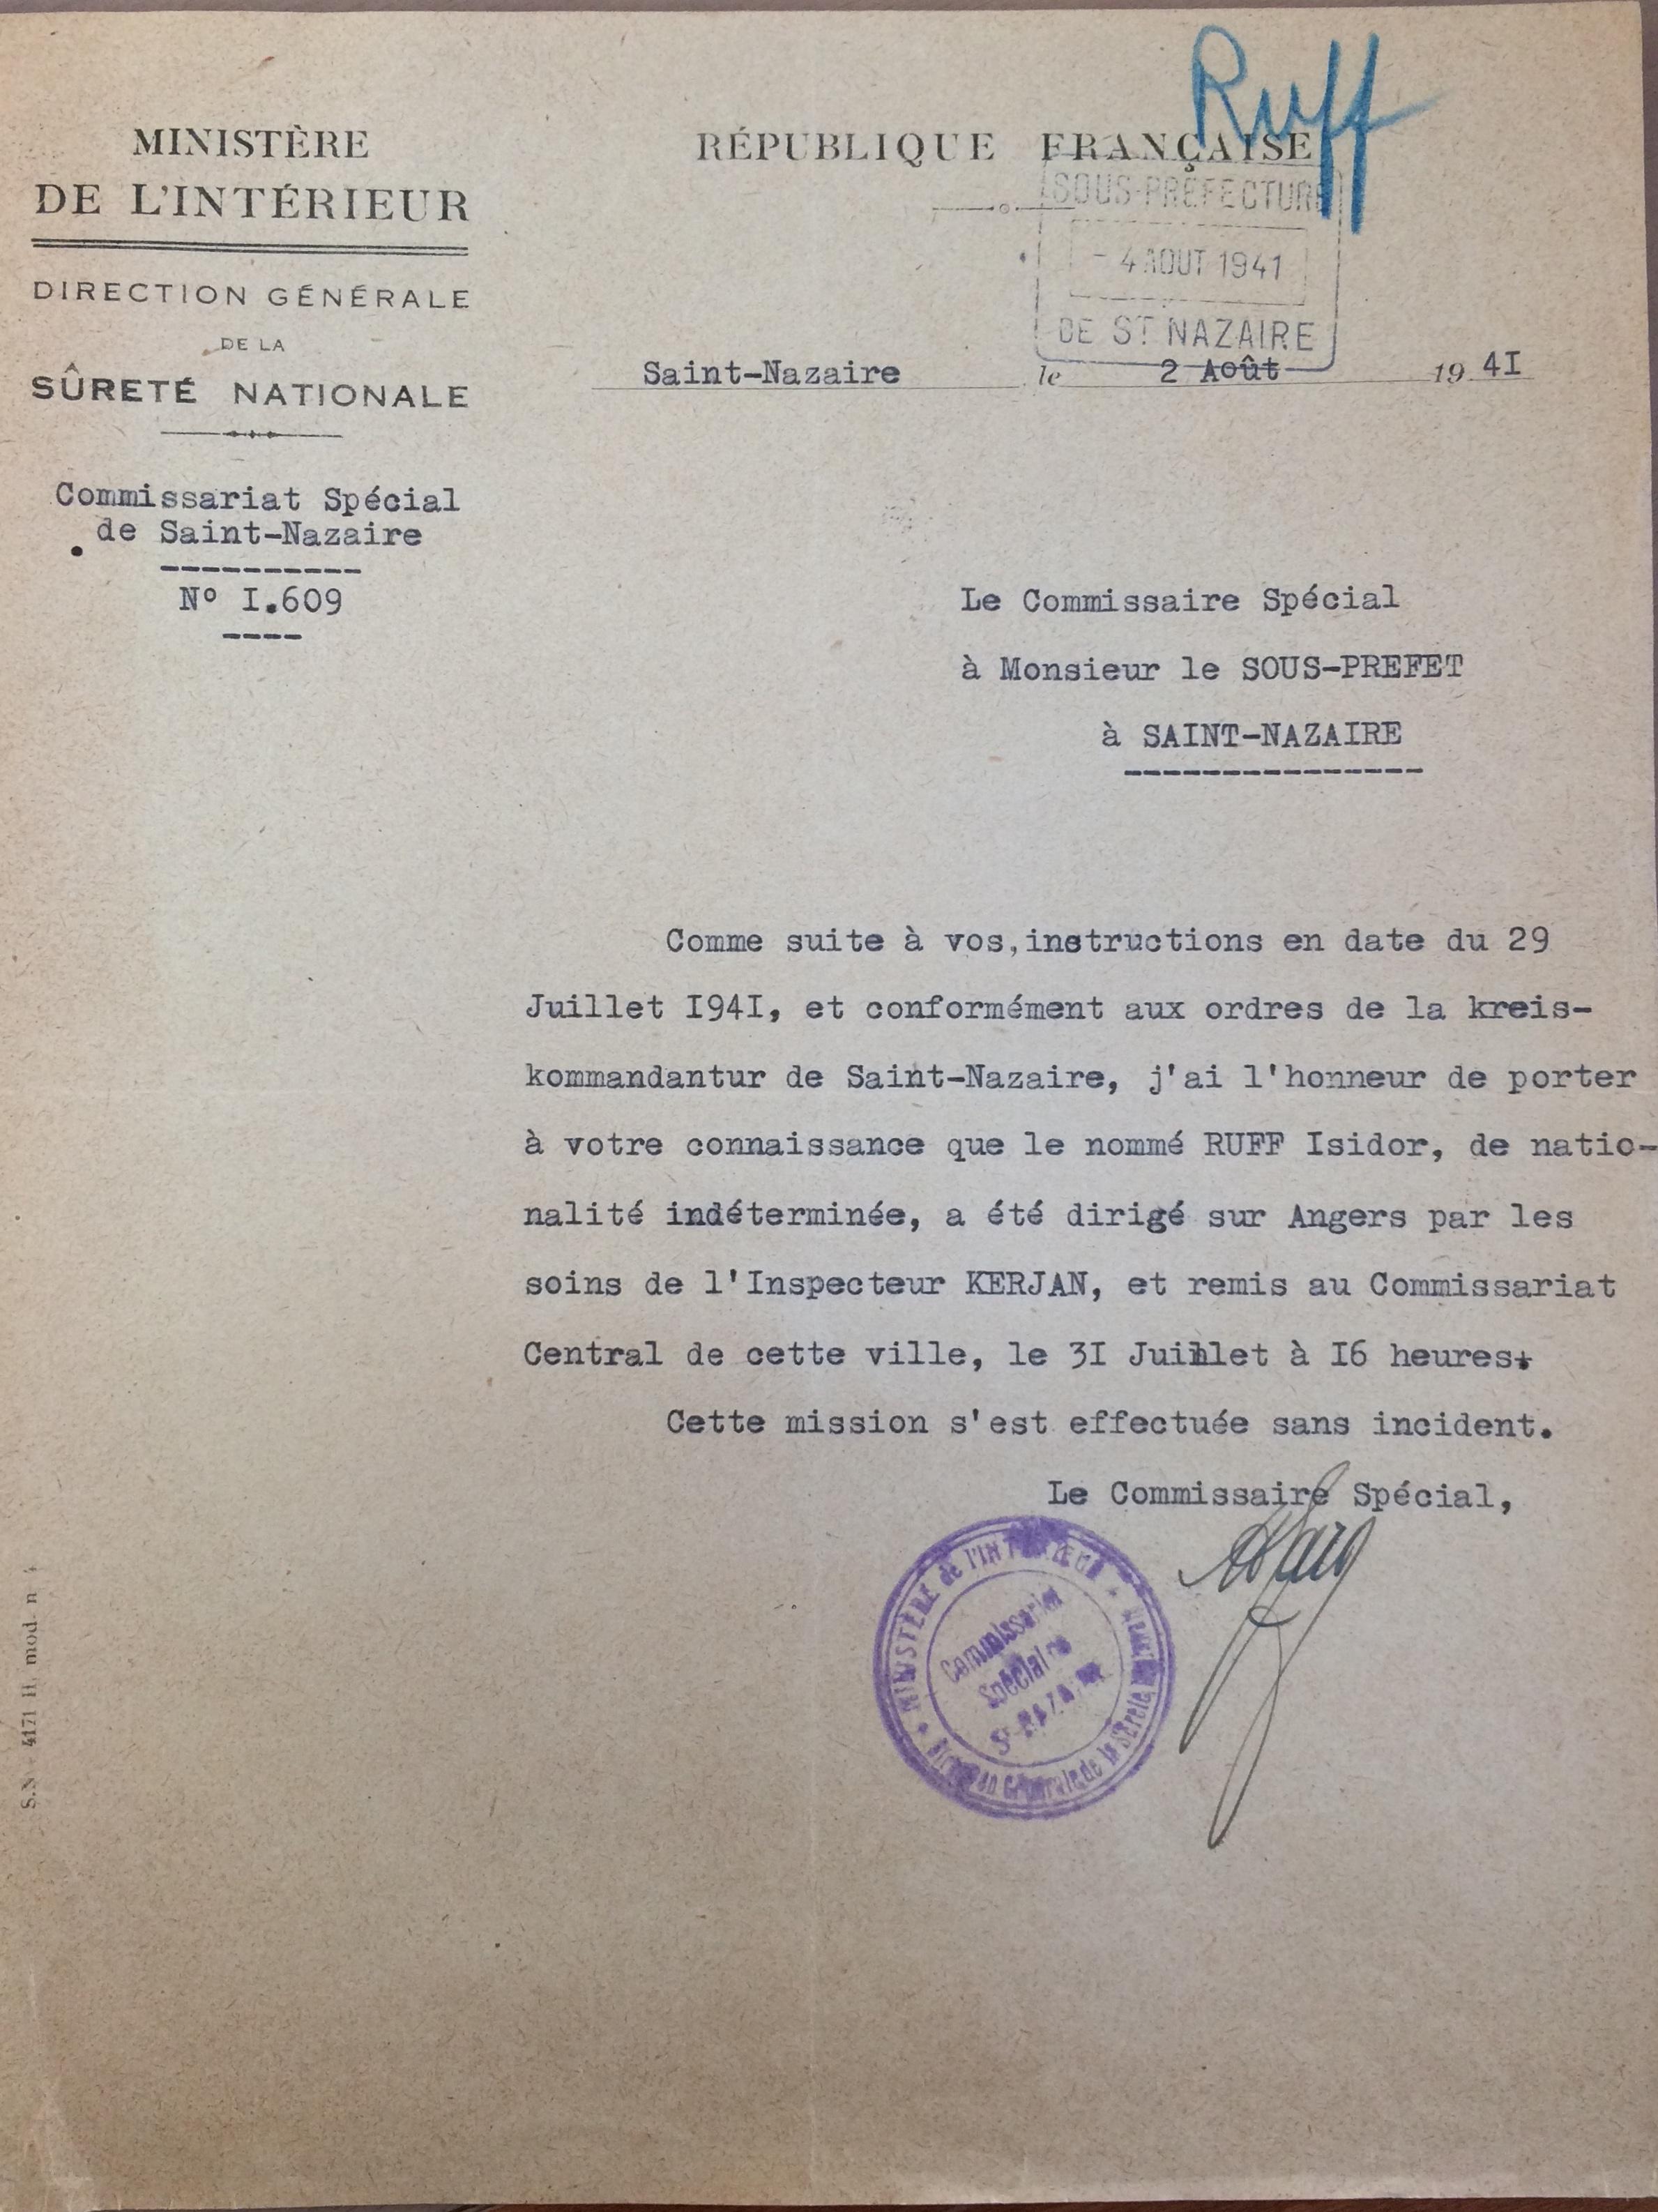 Police de Saint-Nazaire [ADLA 1803W107]